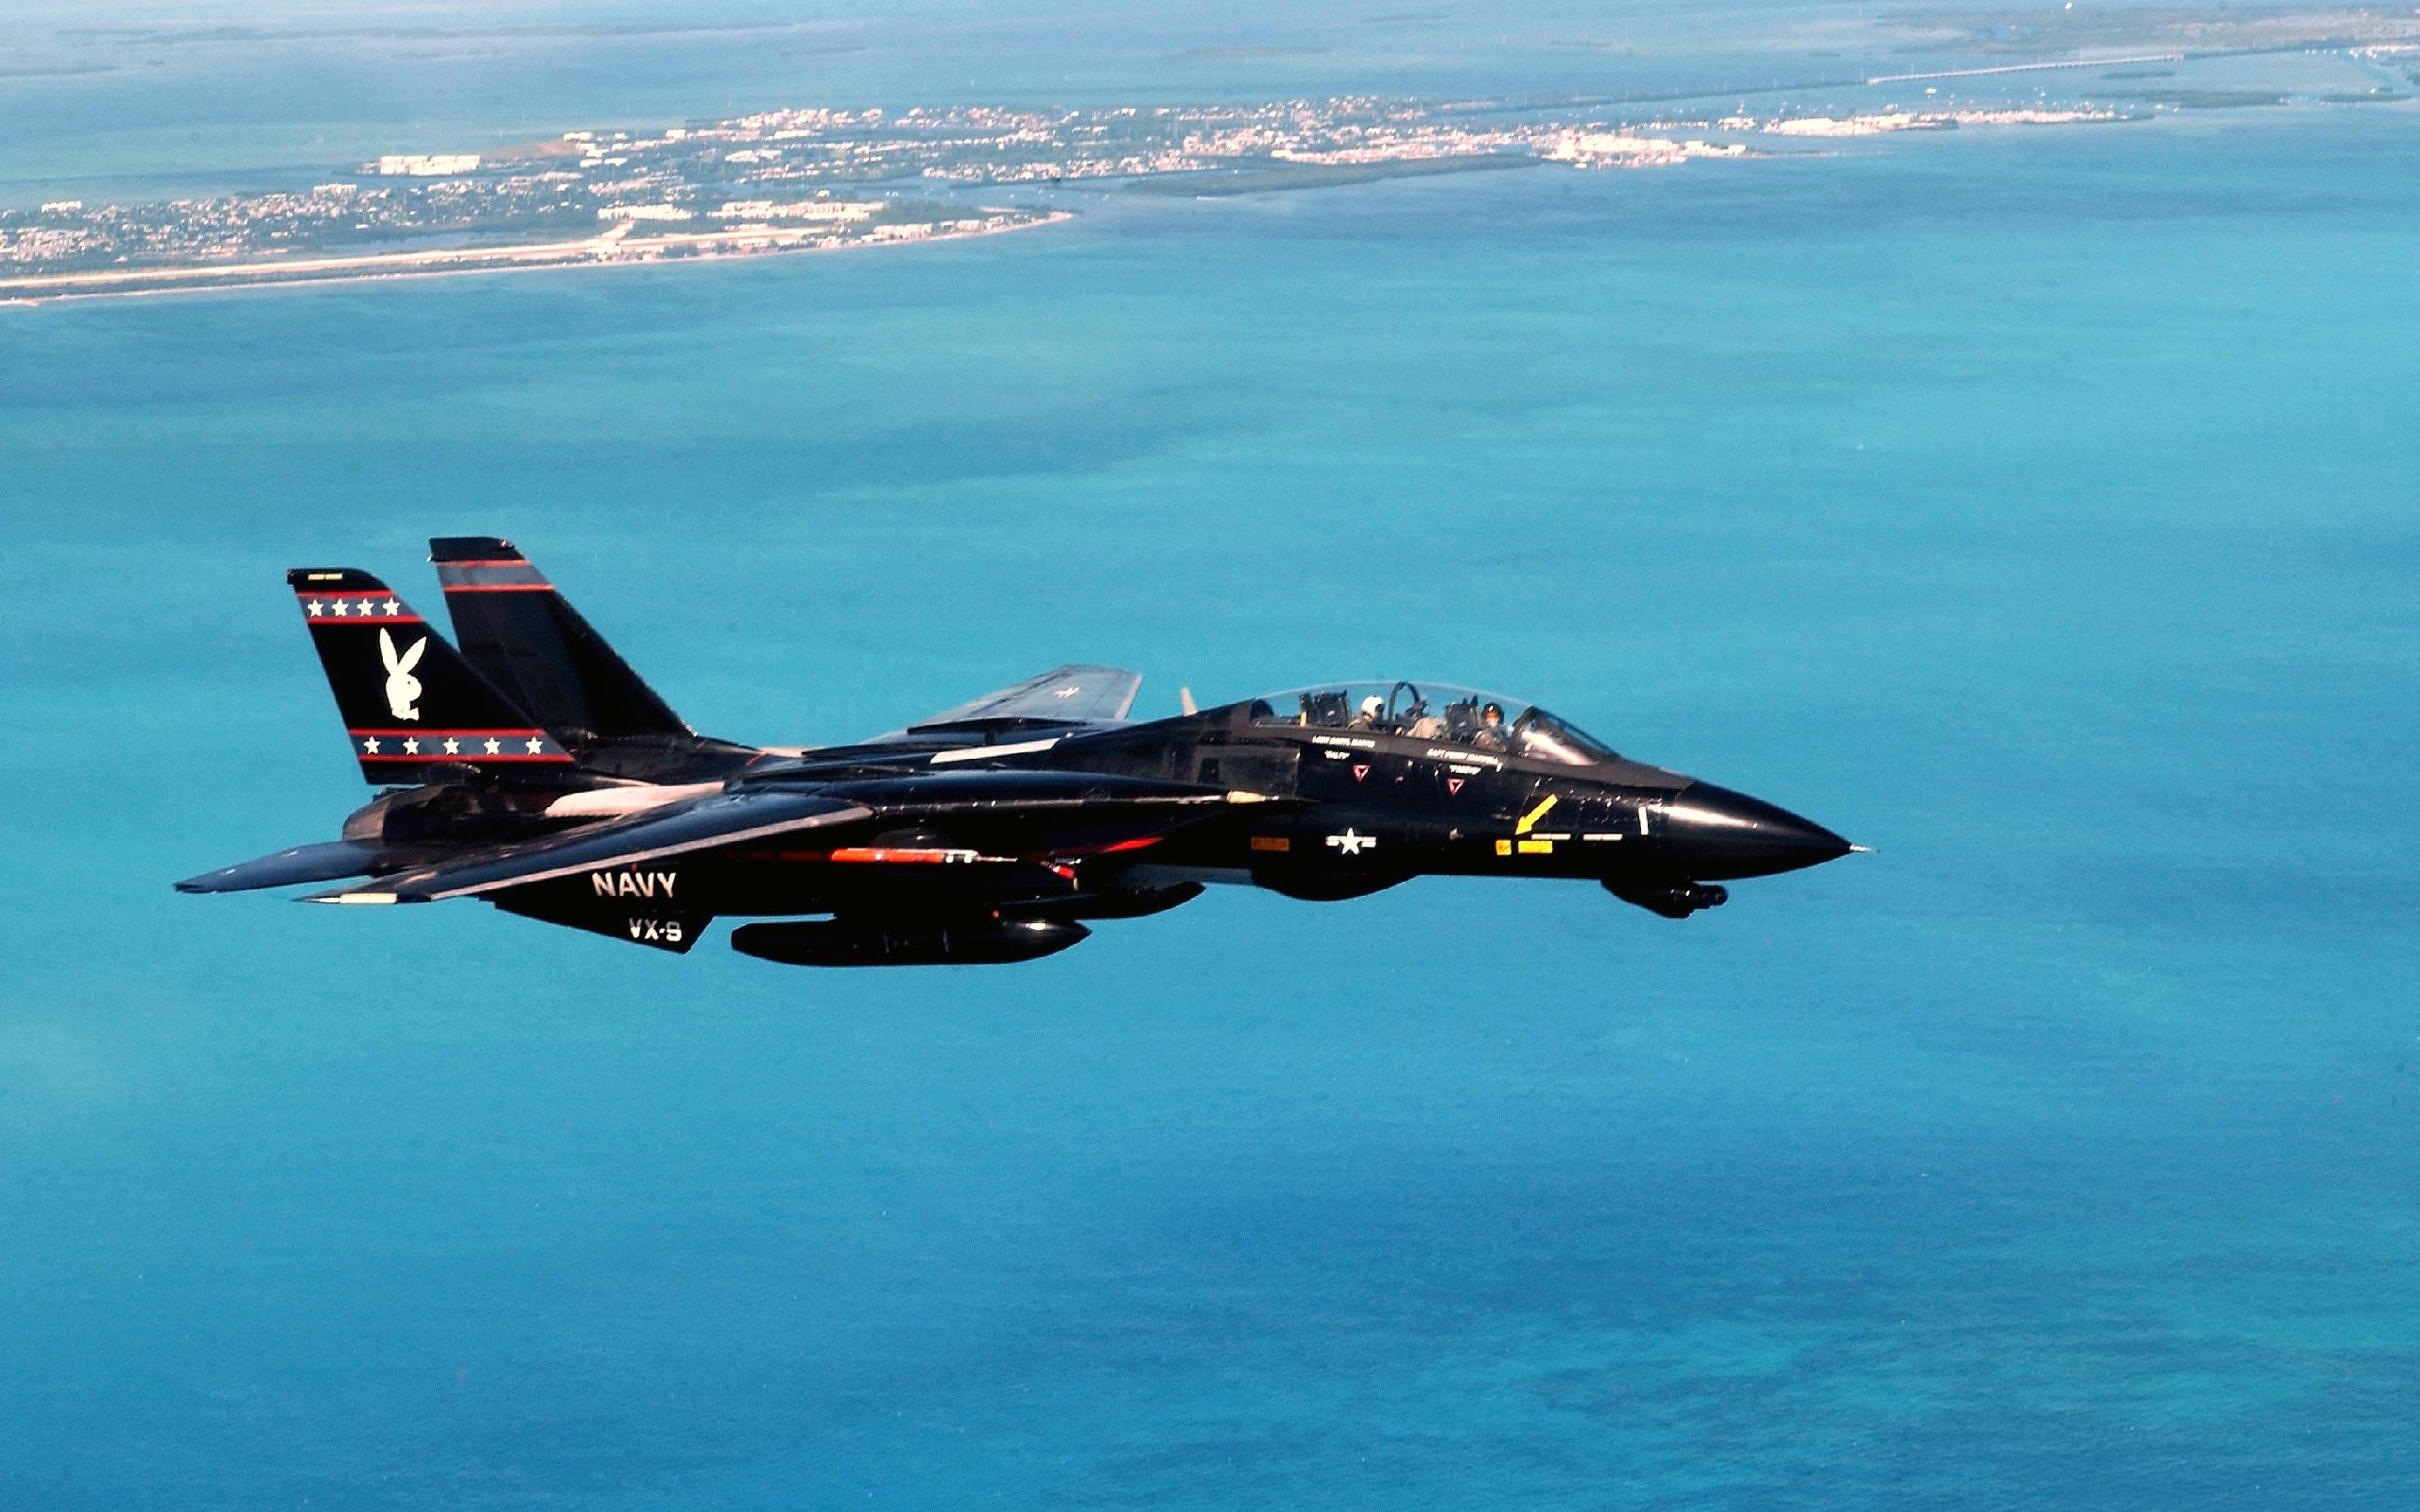 Grumman F-14 Tomcat HD Wallpaper | Background Image ...